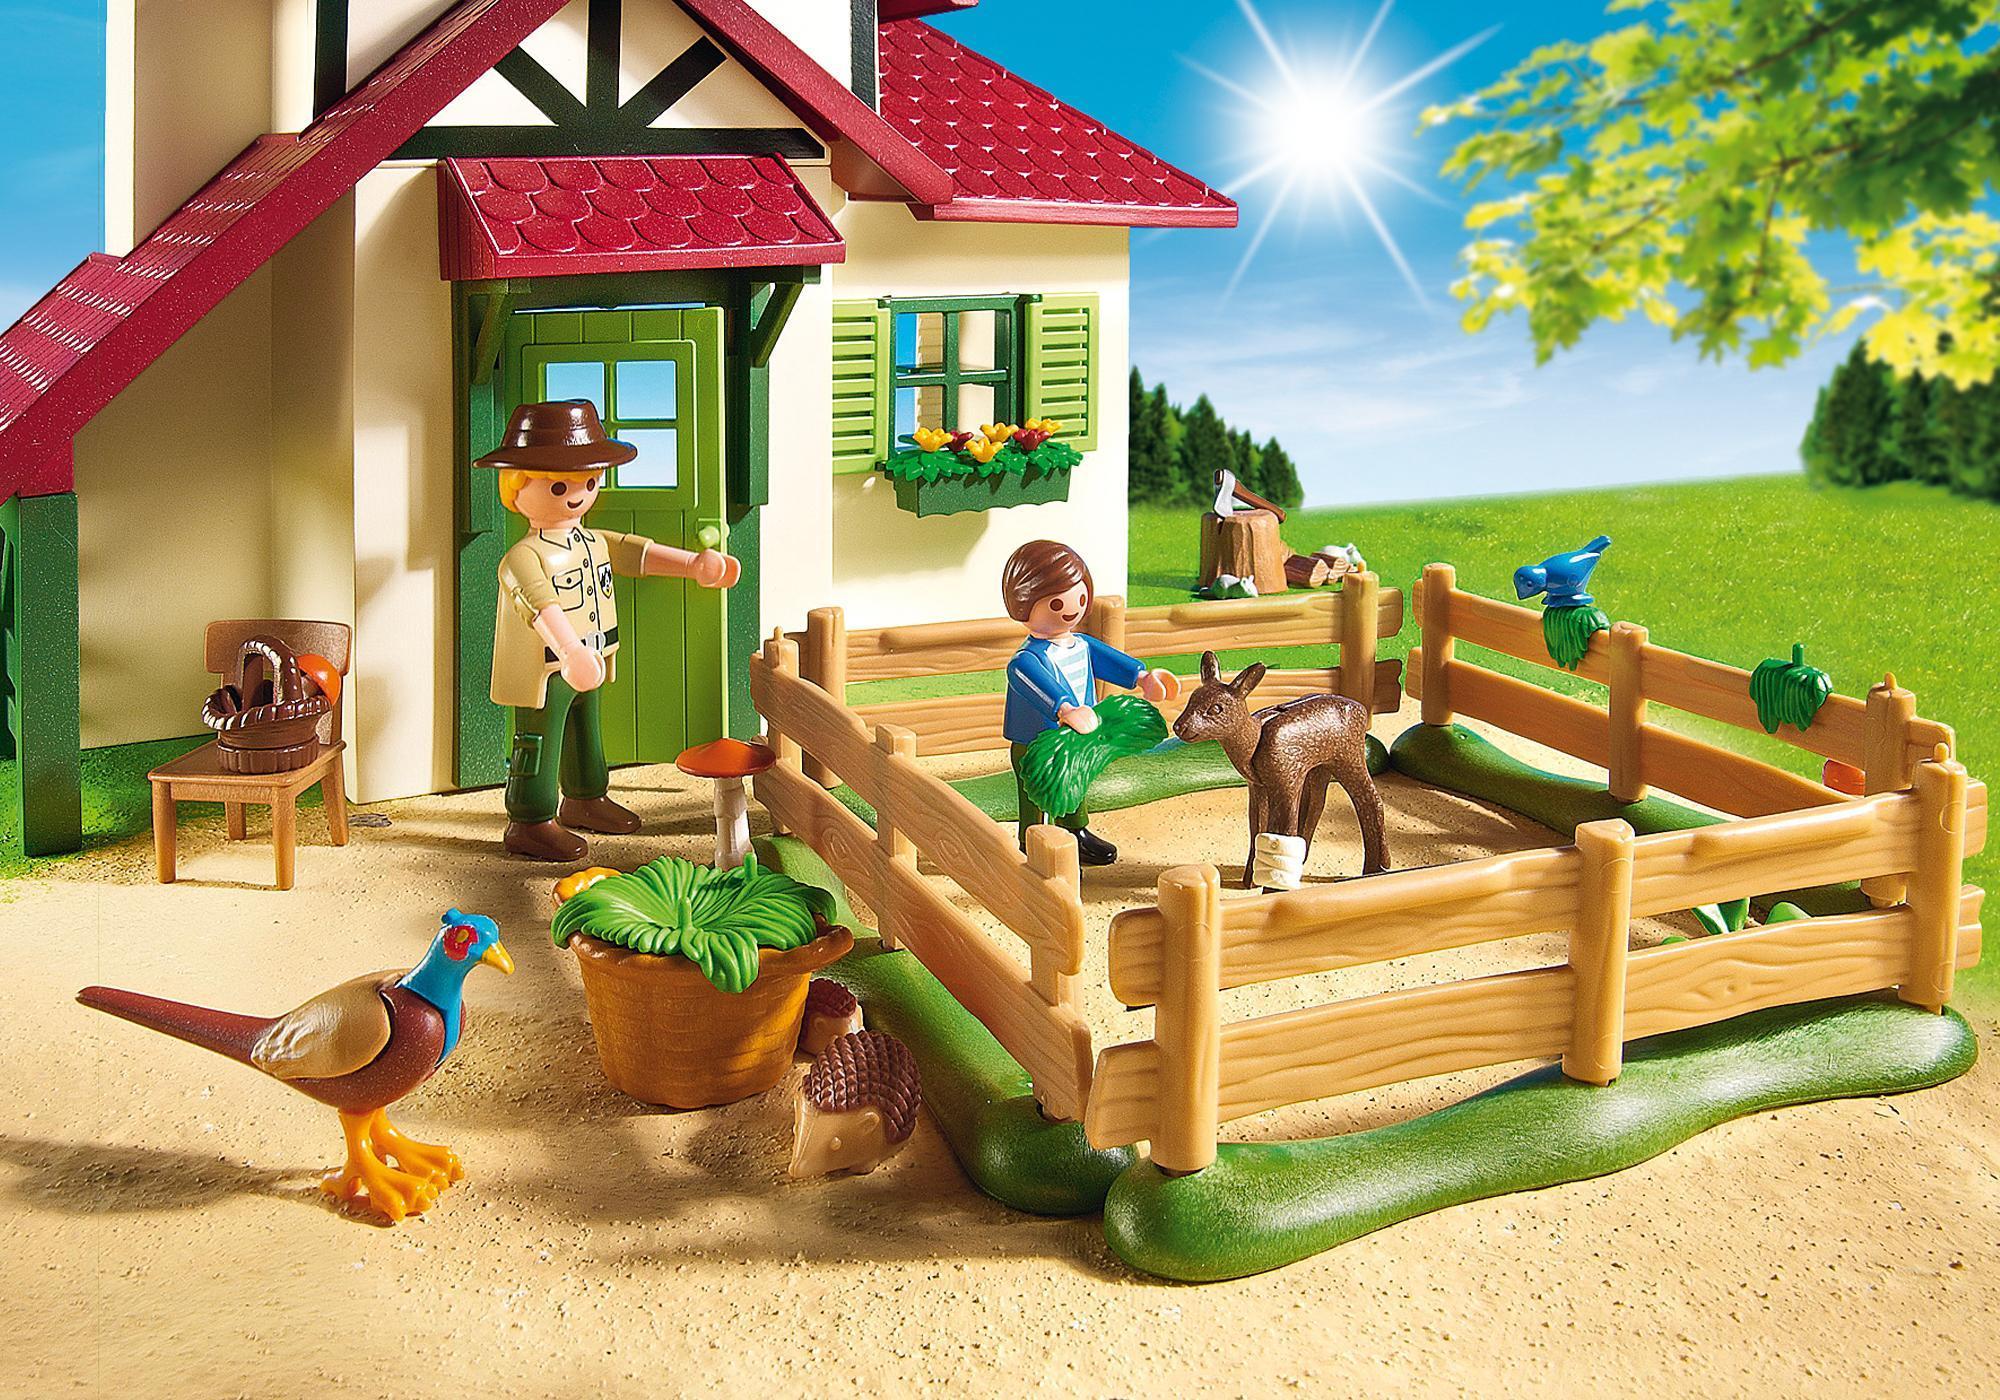 http://media.playmobil.com/i/playmobil/6811_product_extra2/Forsthaus